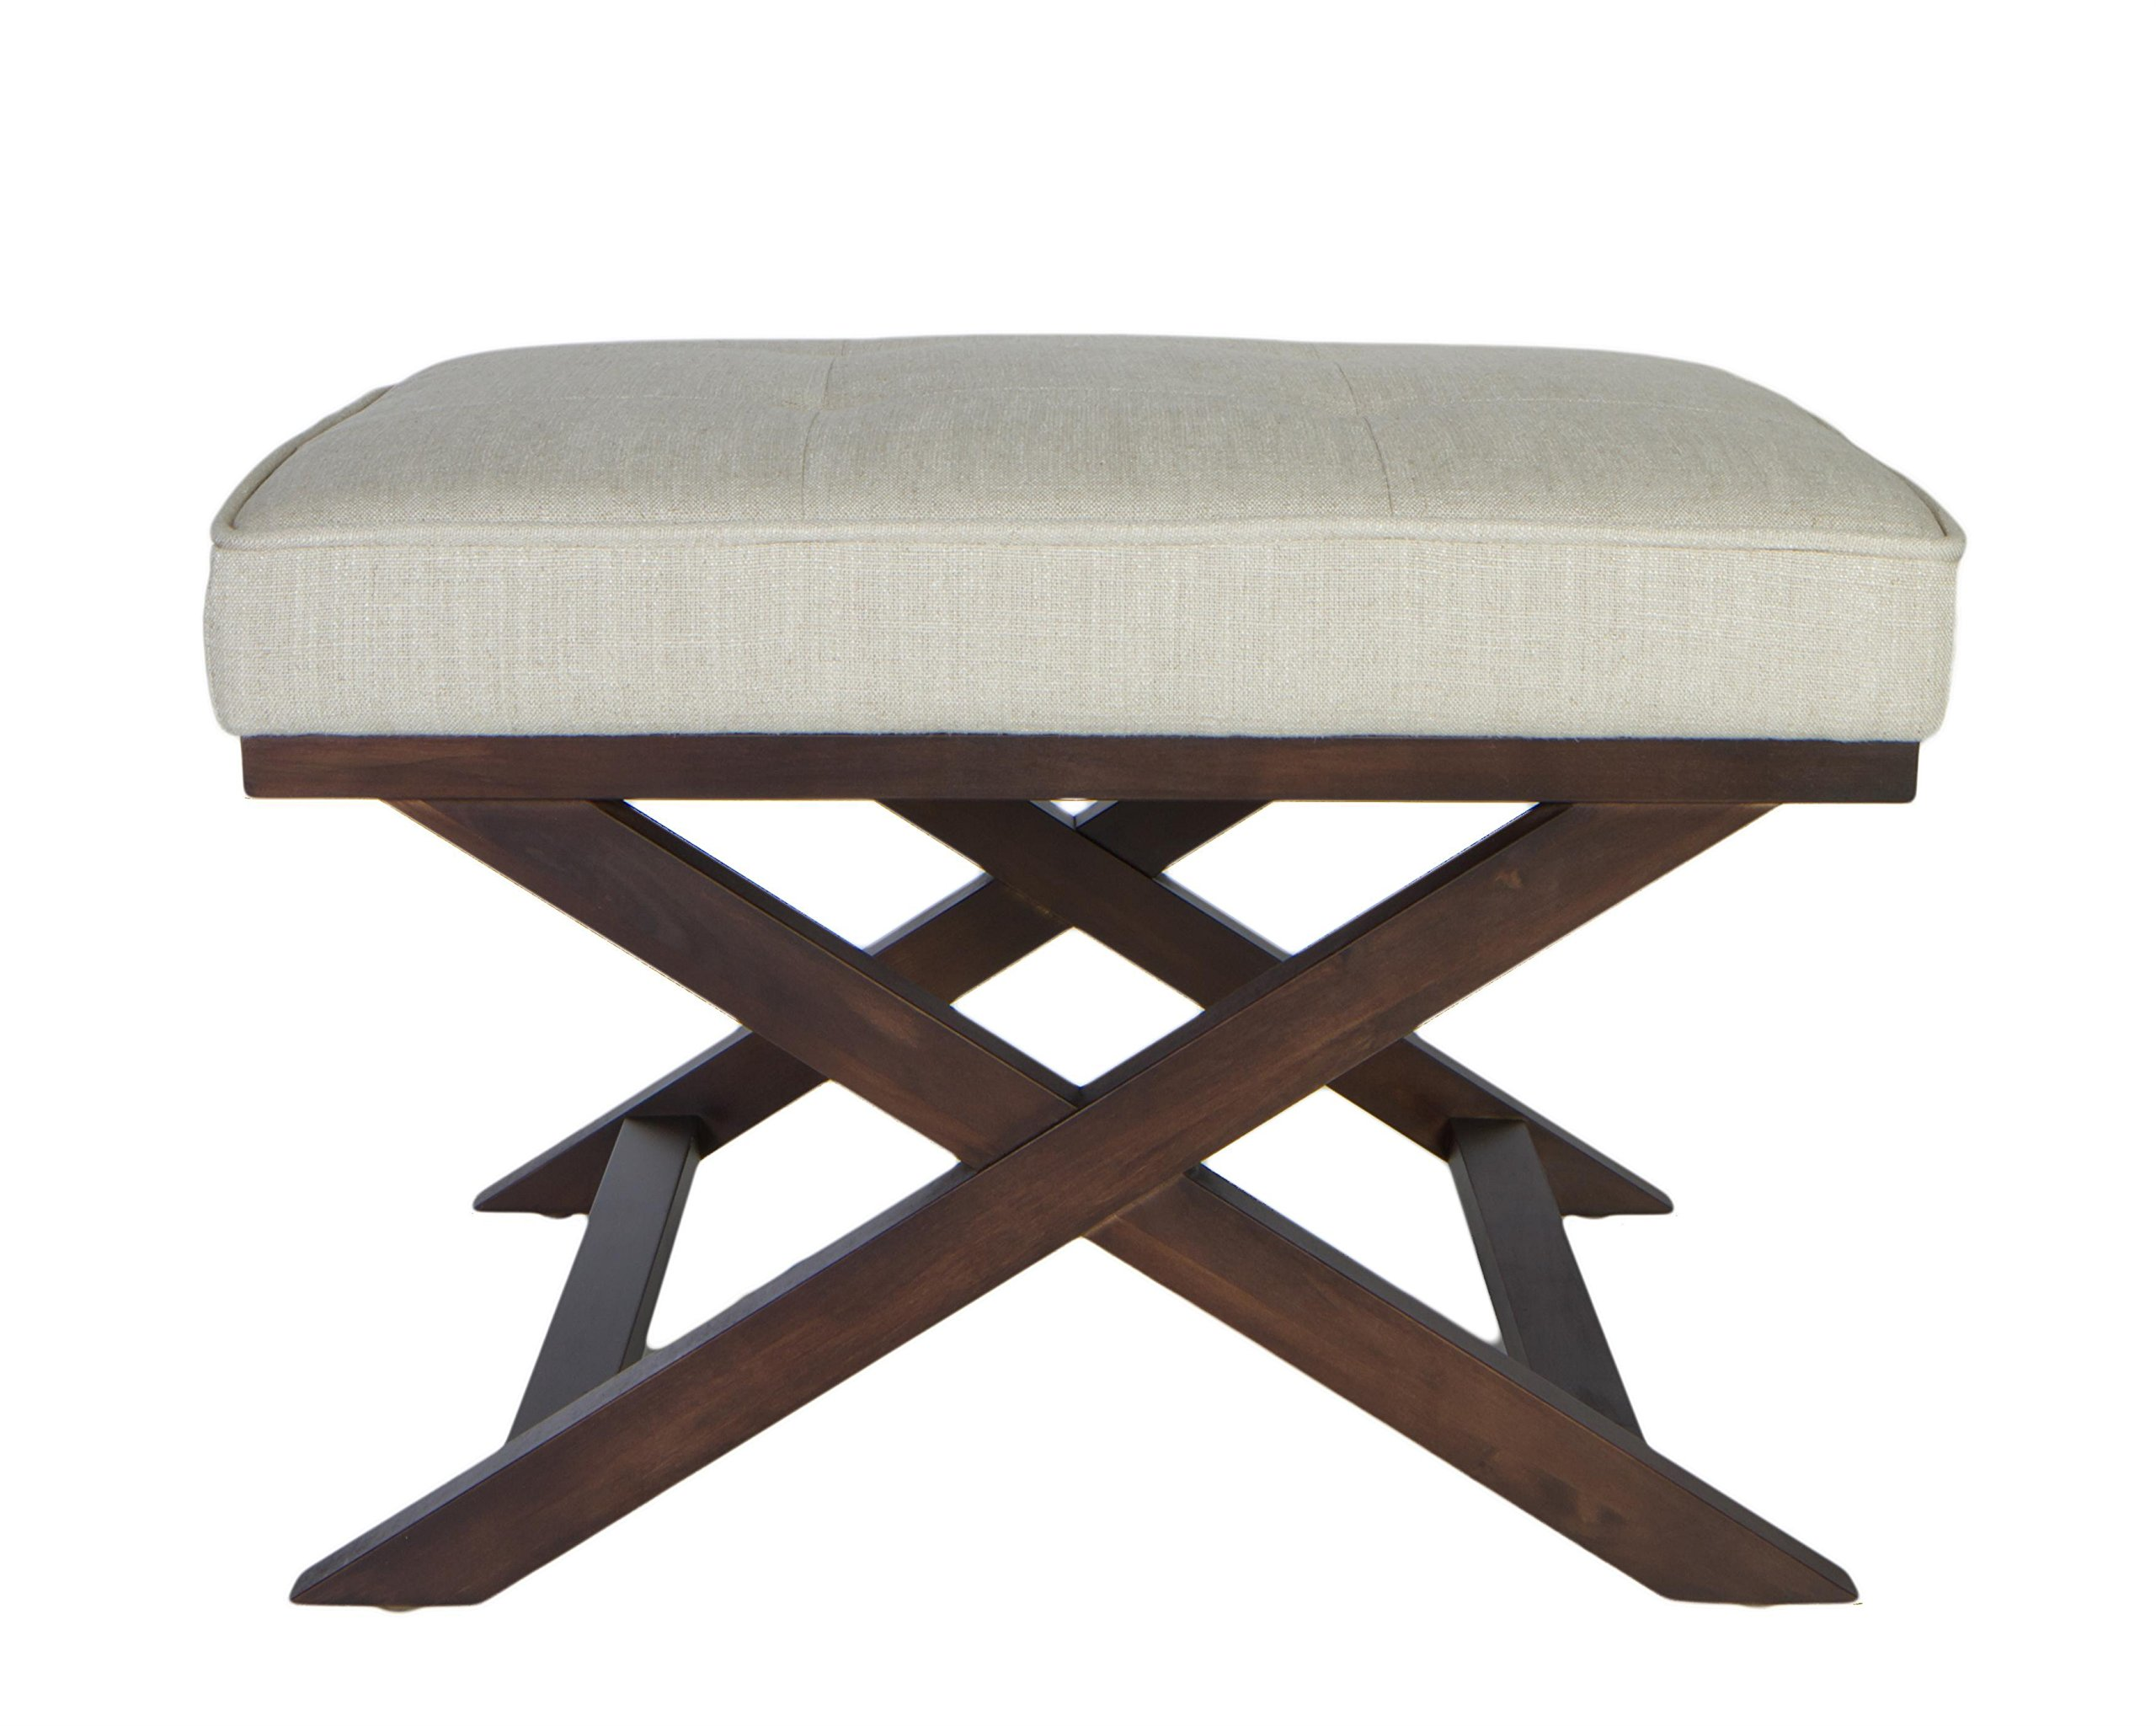 Cortesi Home OT168333 Ari ''X'' Bench in Linen Fabric with Walnut Wood Legs, Beige